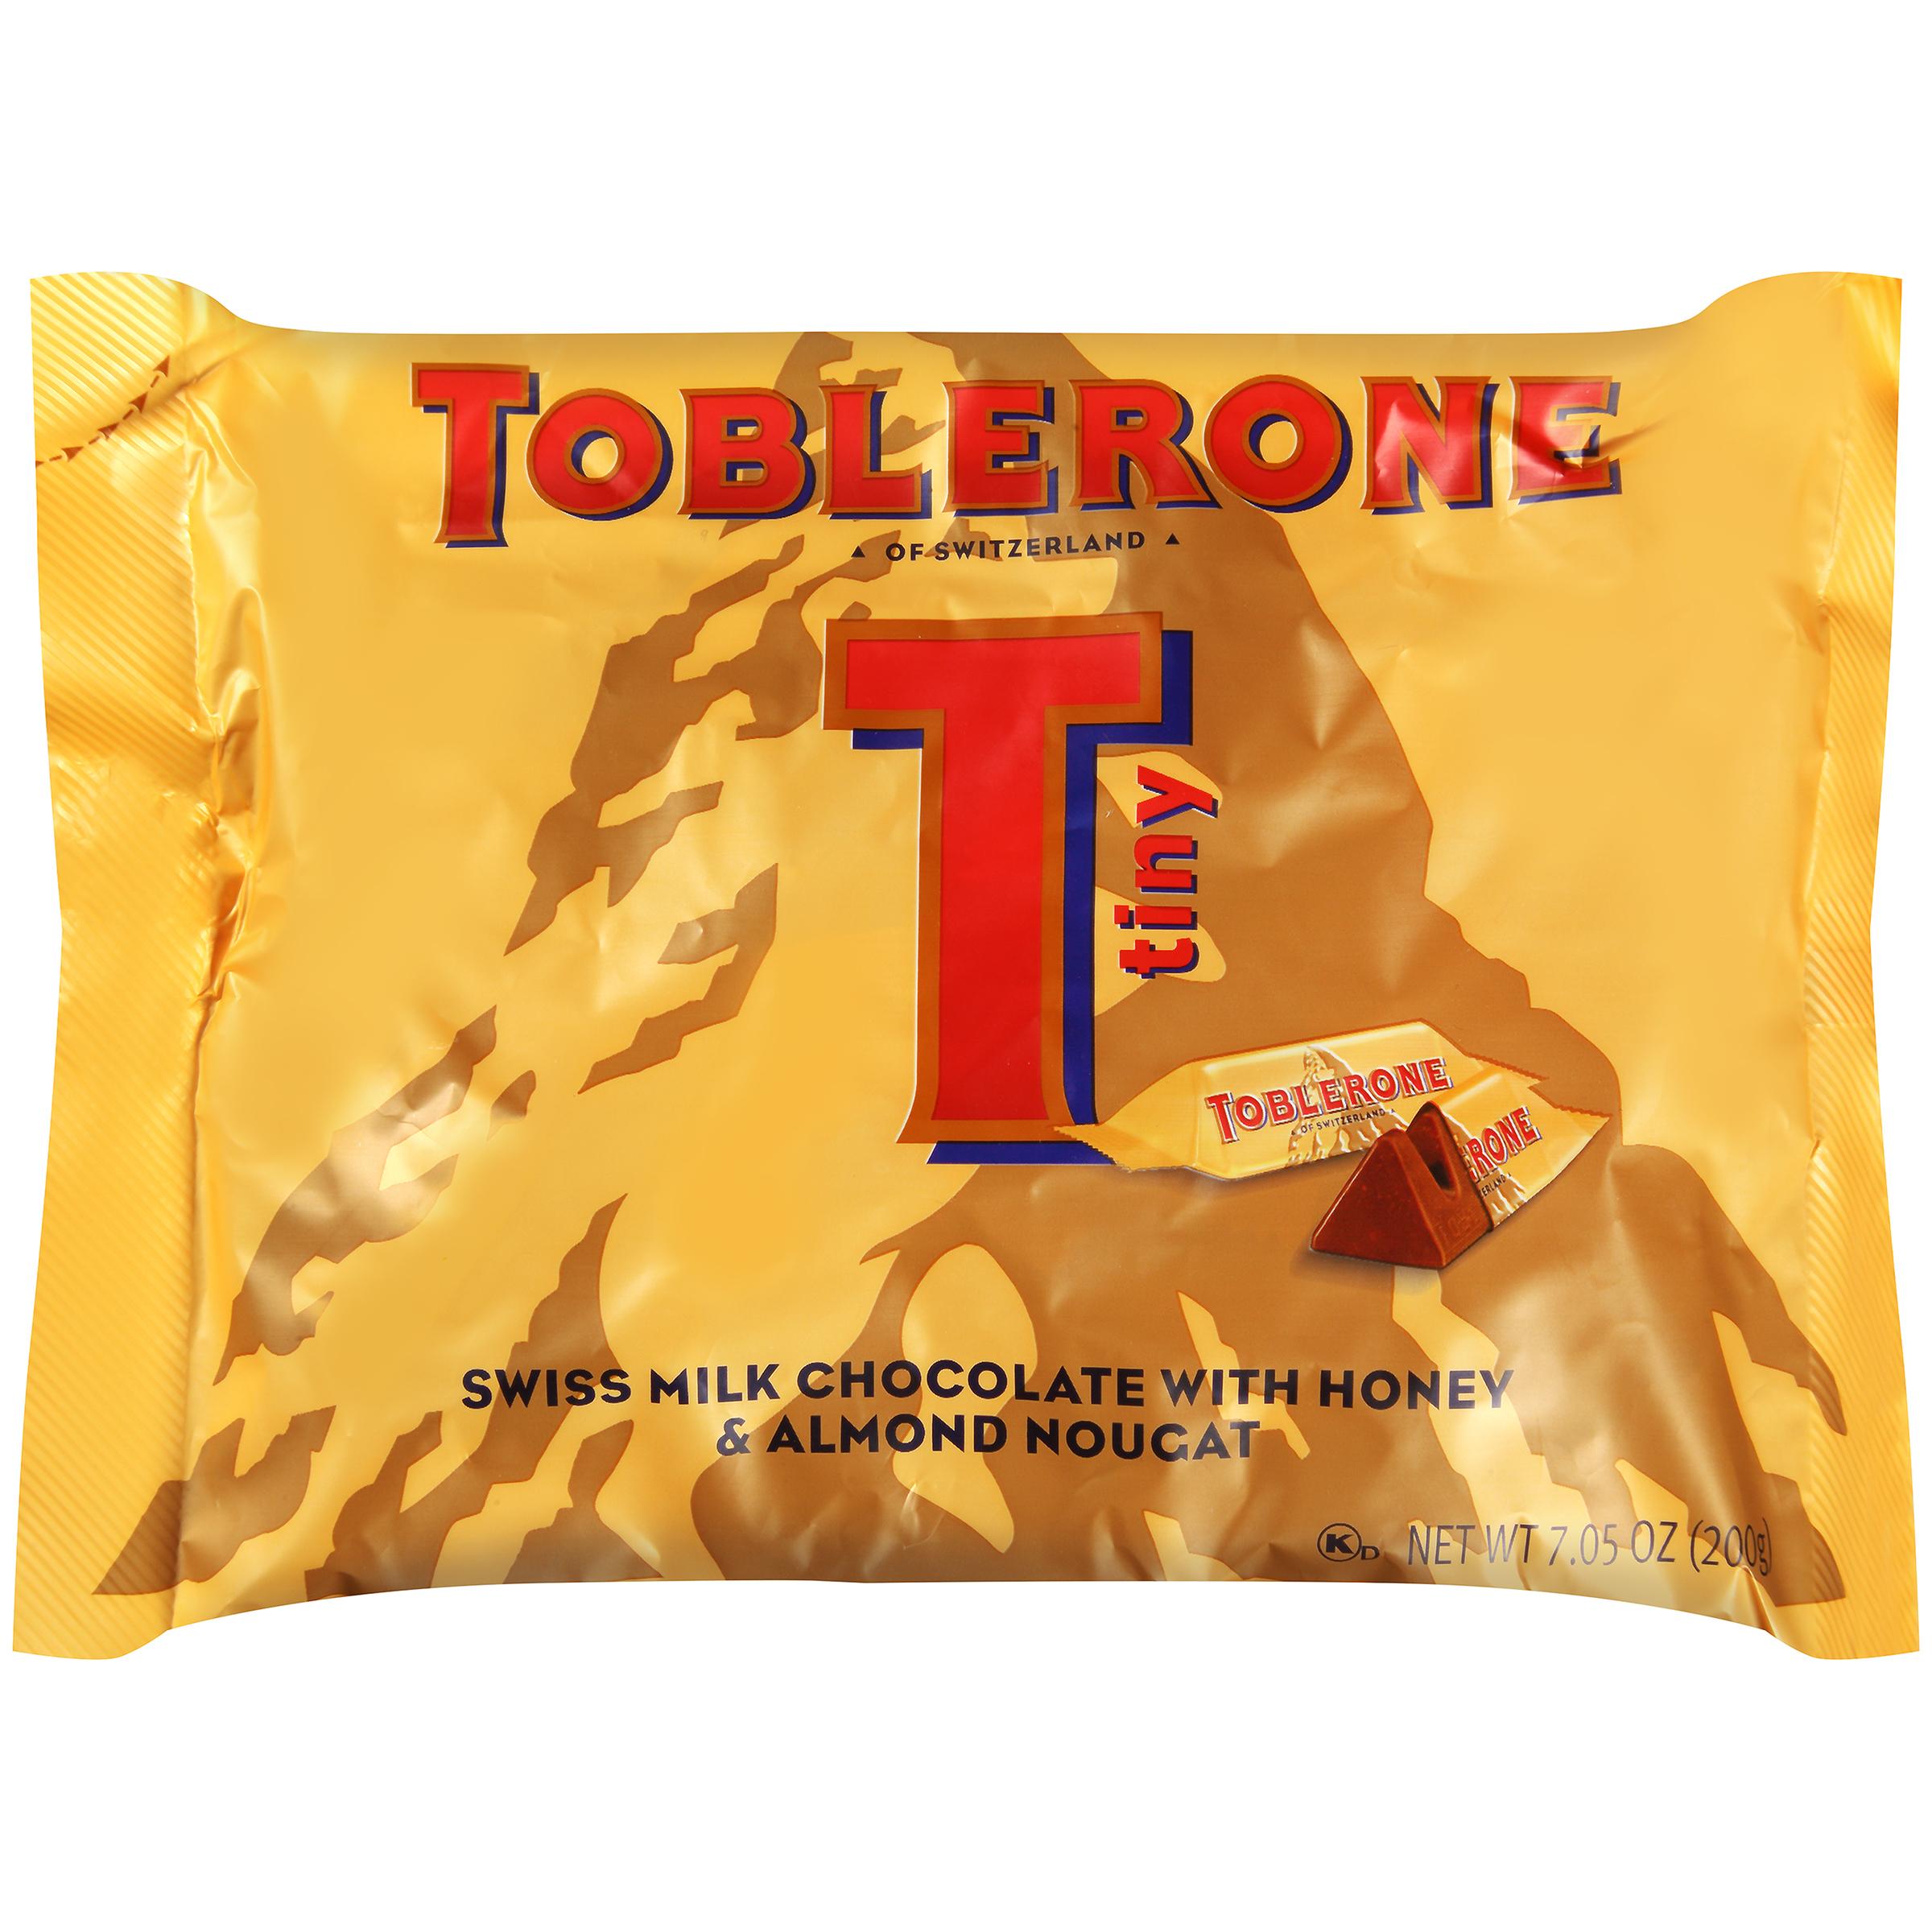 TOBLERONE Mini Milk Chocolate Chocolate Bar-Minis 7.05 oz